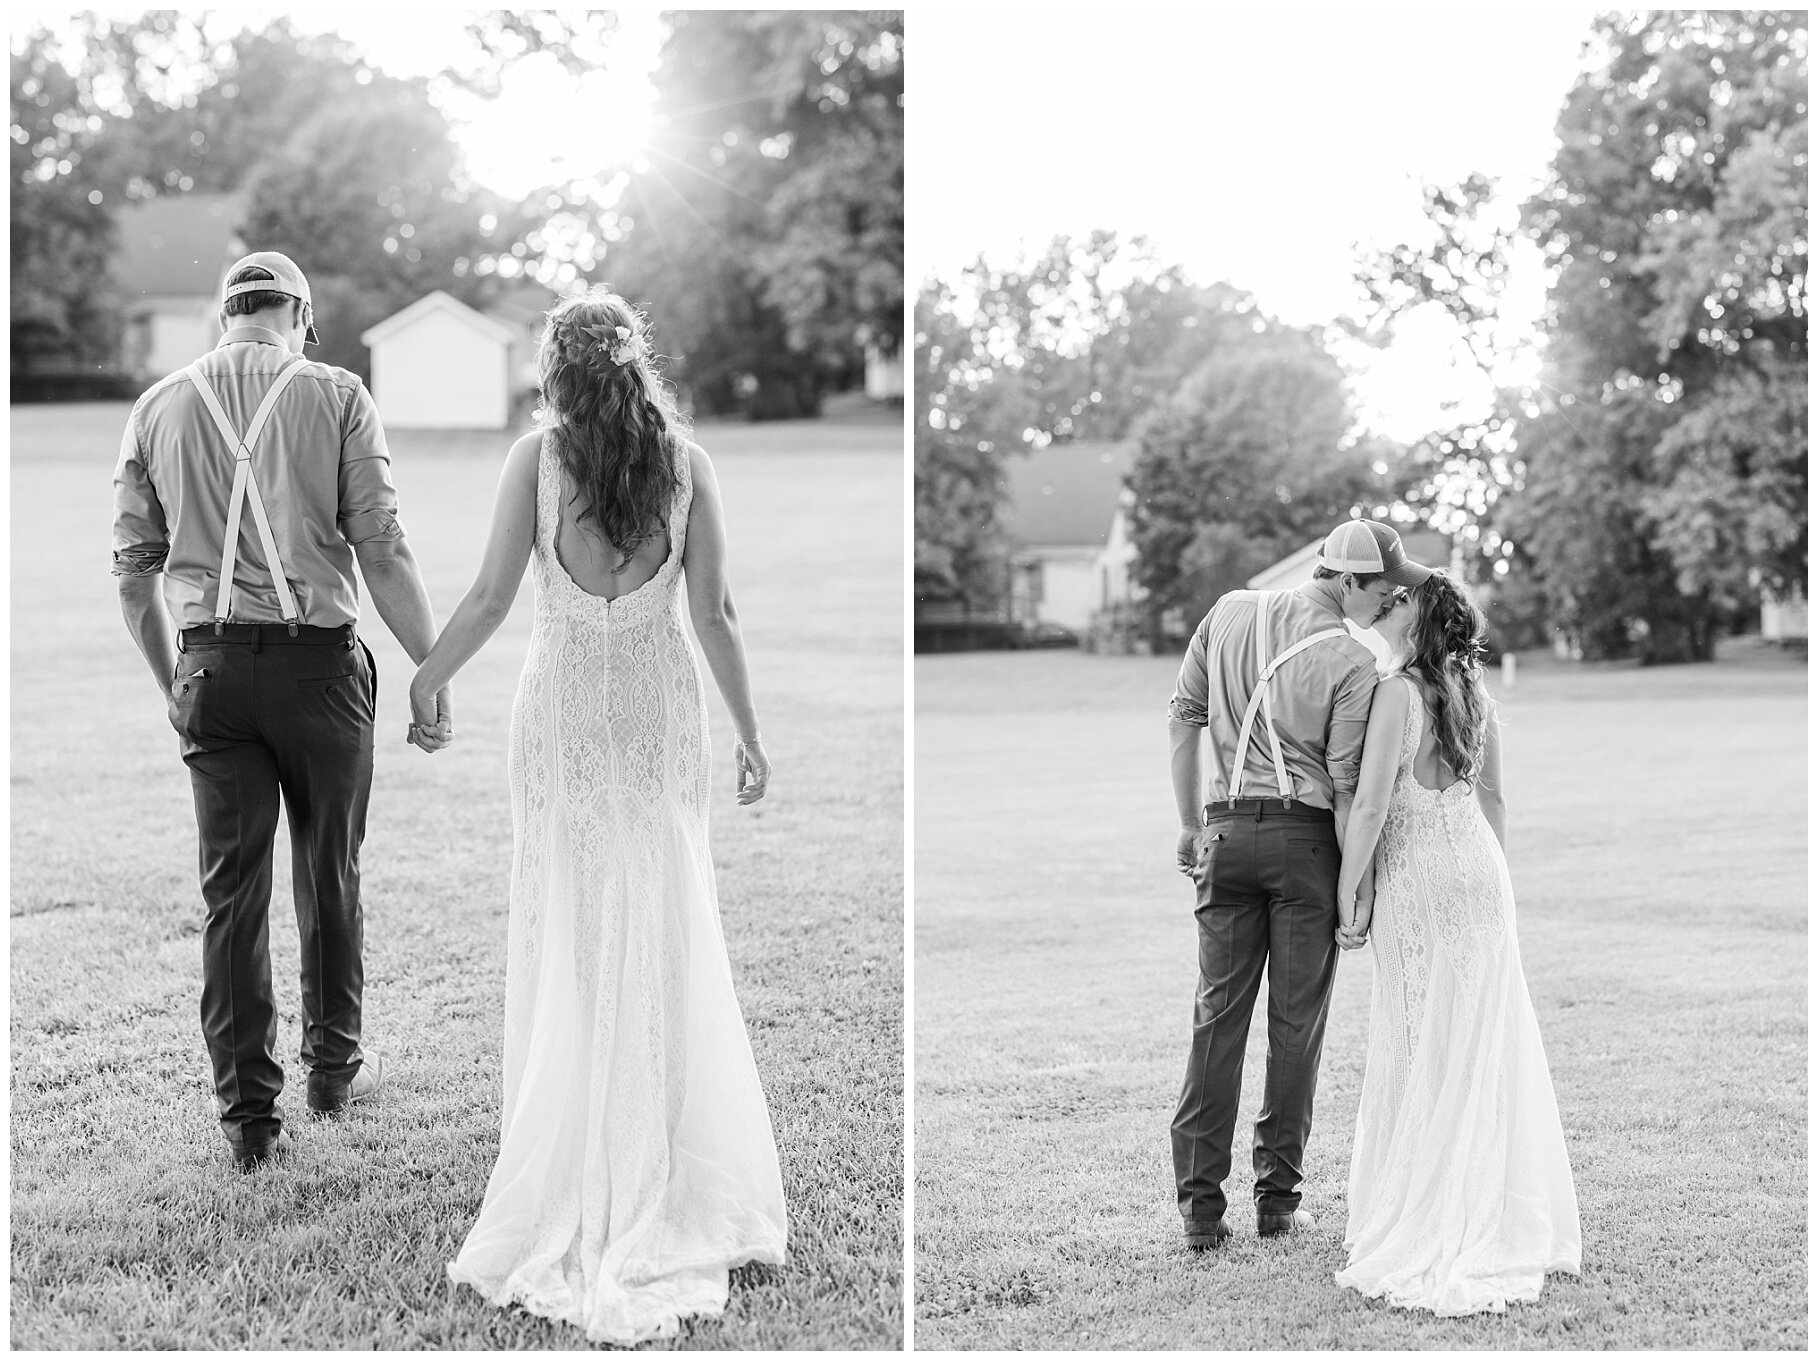 Earth-Toned Wedding by KKP Associate Wedding Photographer and Kelsi Kliethermes Photography Best Columbia Missouri Wedding Photographer_0036.jpg